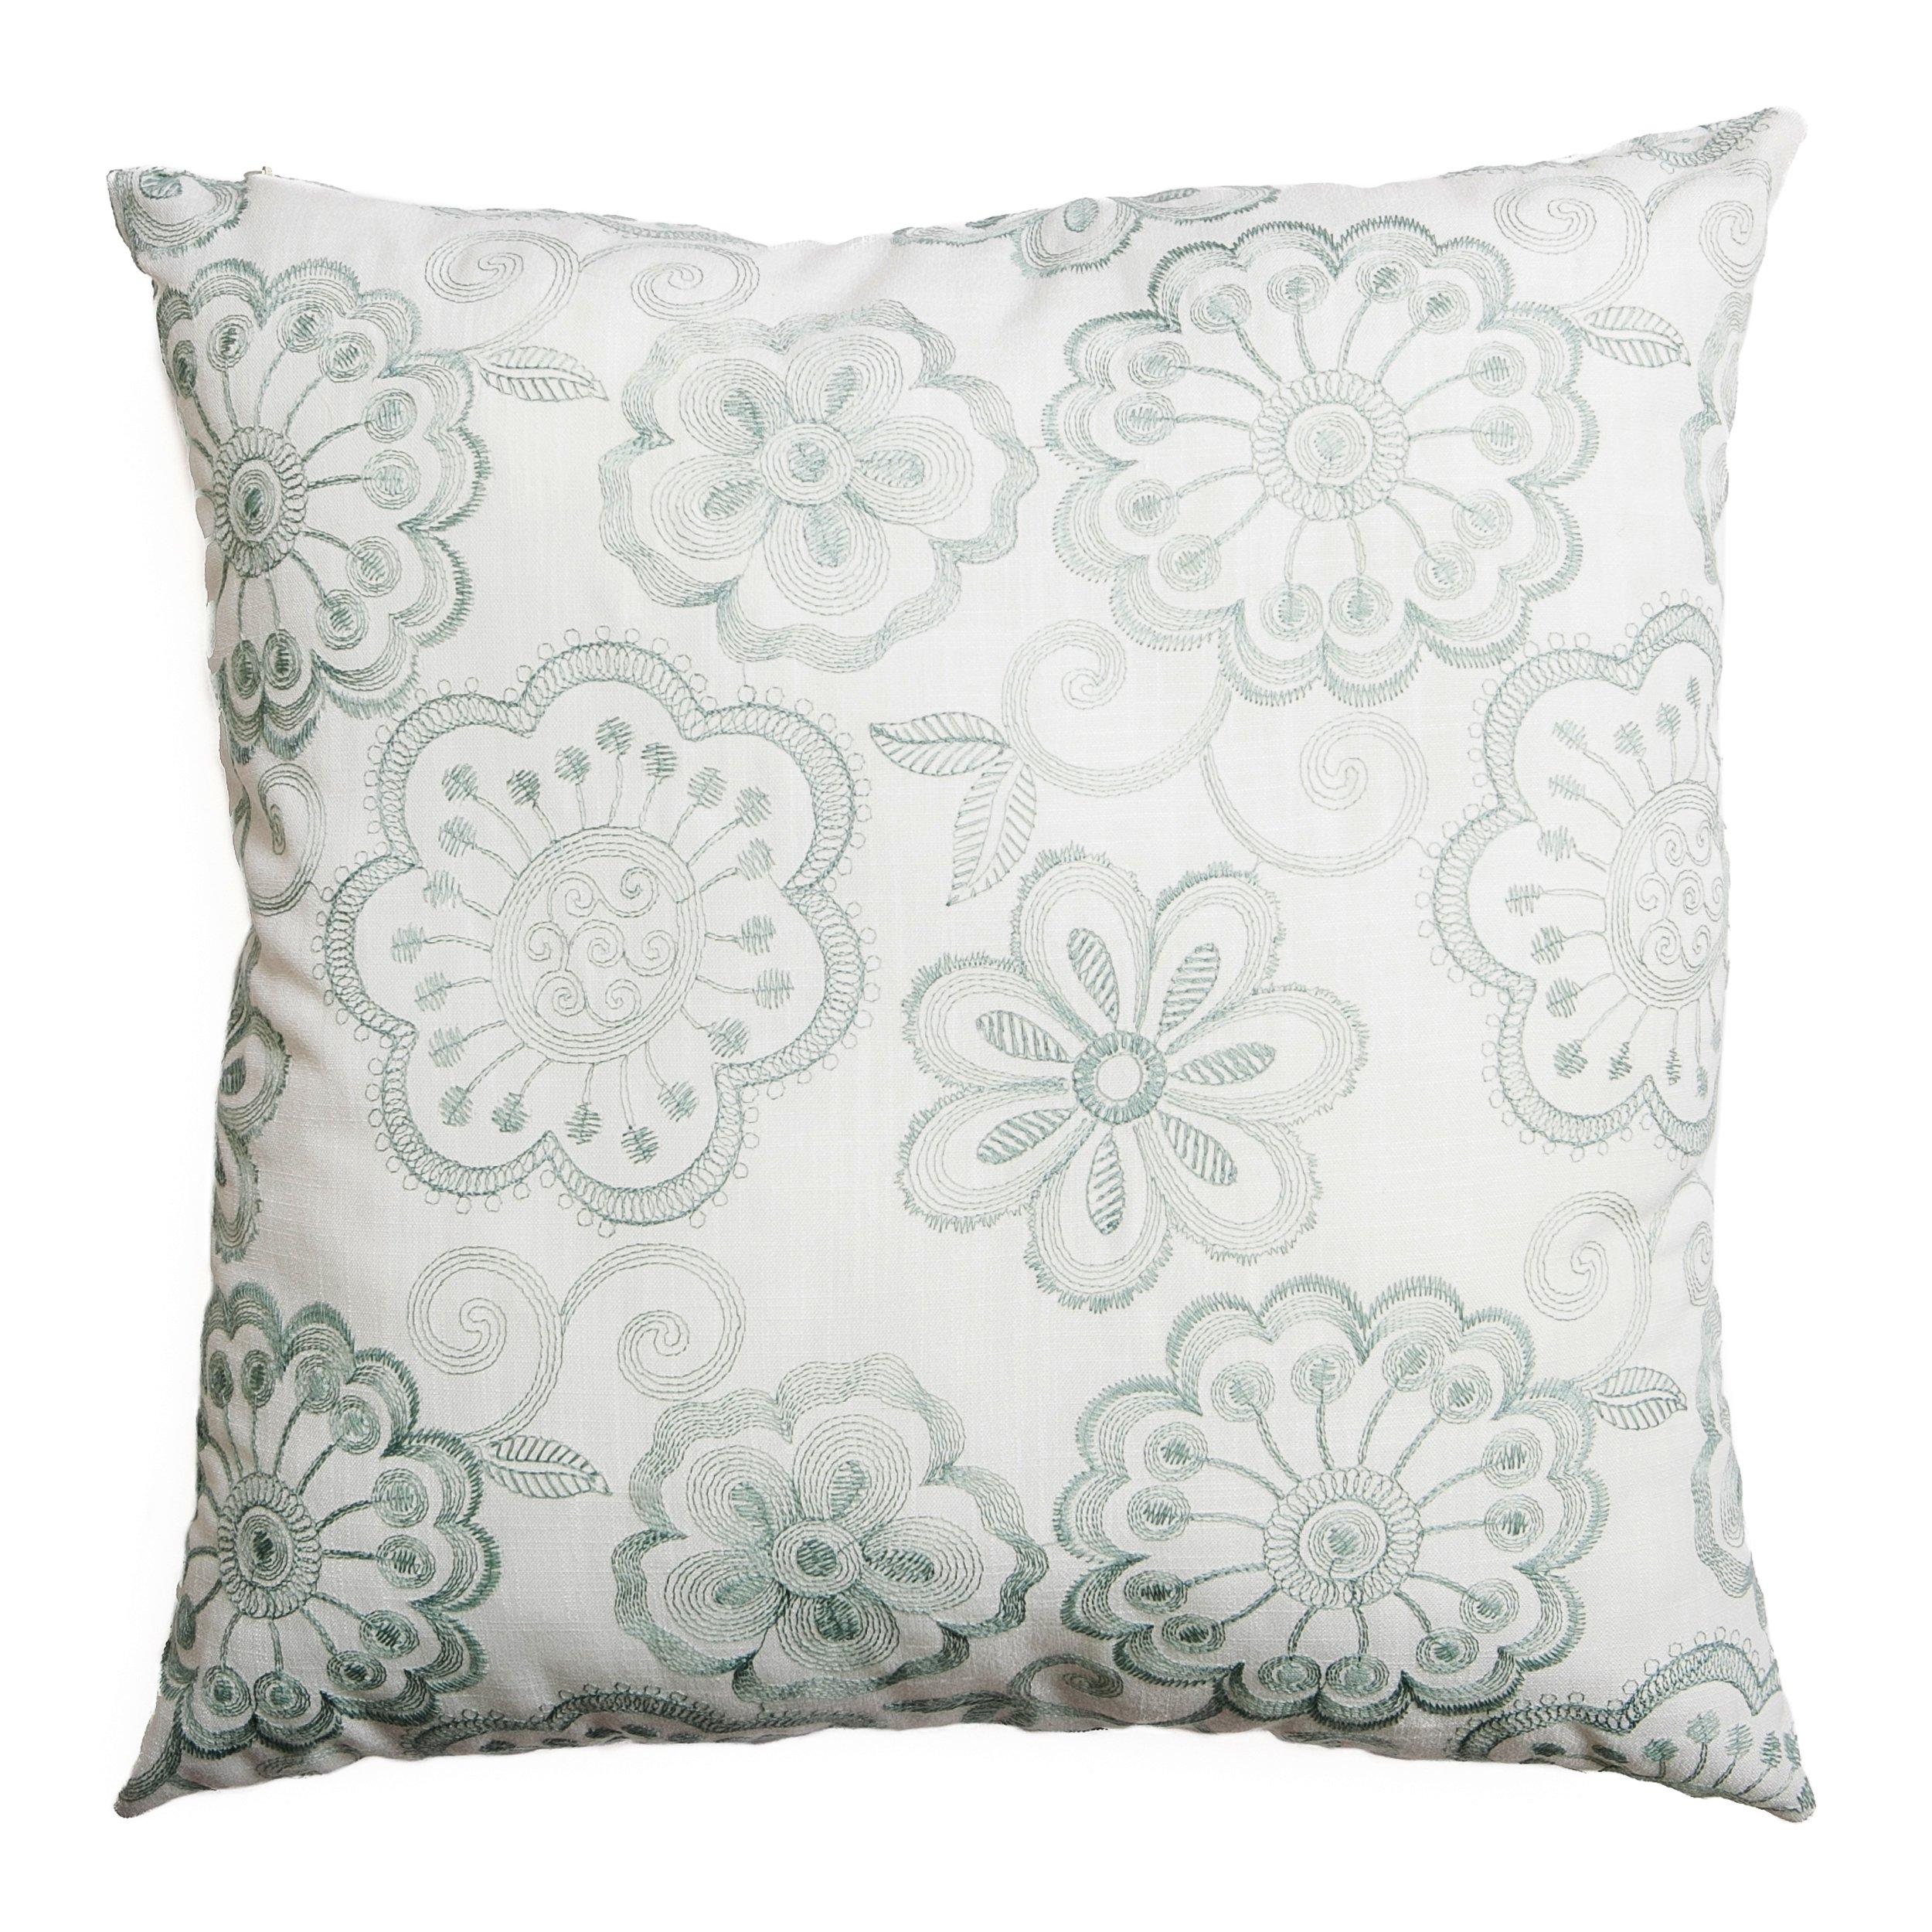 Softline Home Fashions 924ESP46818XPF Estero Decorative Pillow, 18'', Spa